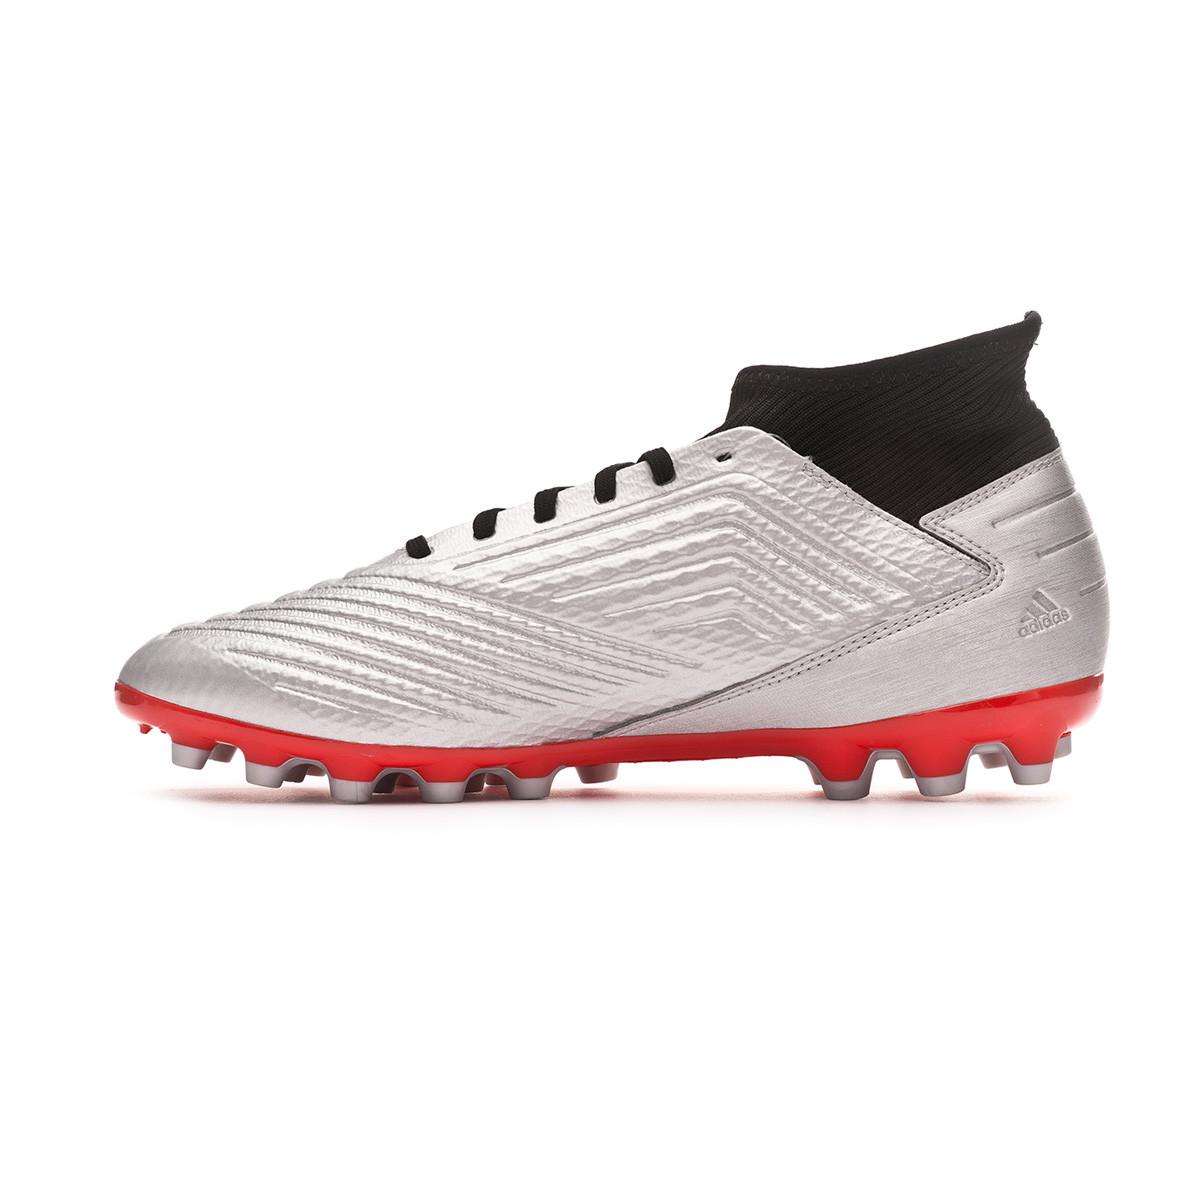 dc2c7d2dac4a9f Scarpe adidas Predator 19.3 AG Silver metallic-Core black-Hi red - Negozio di  calcio Fútbol Emotion